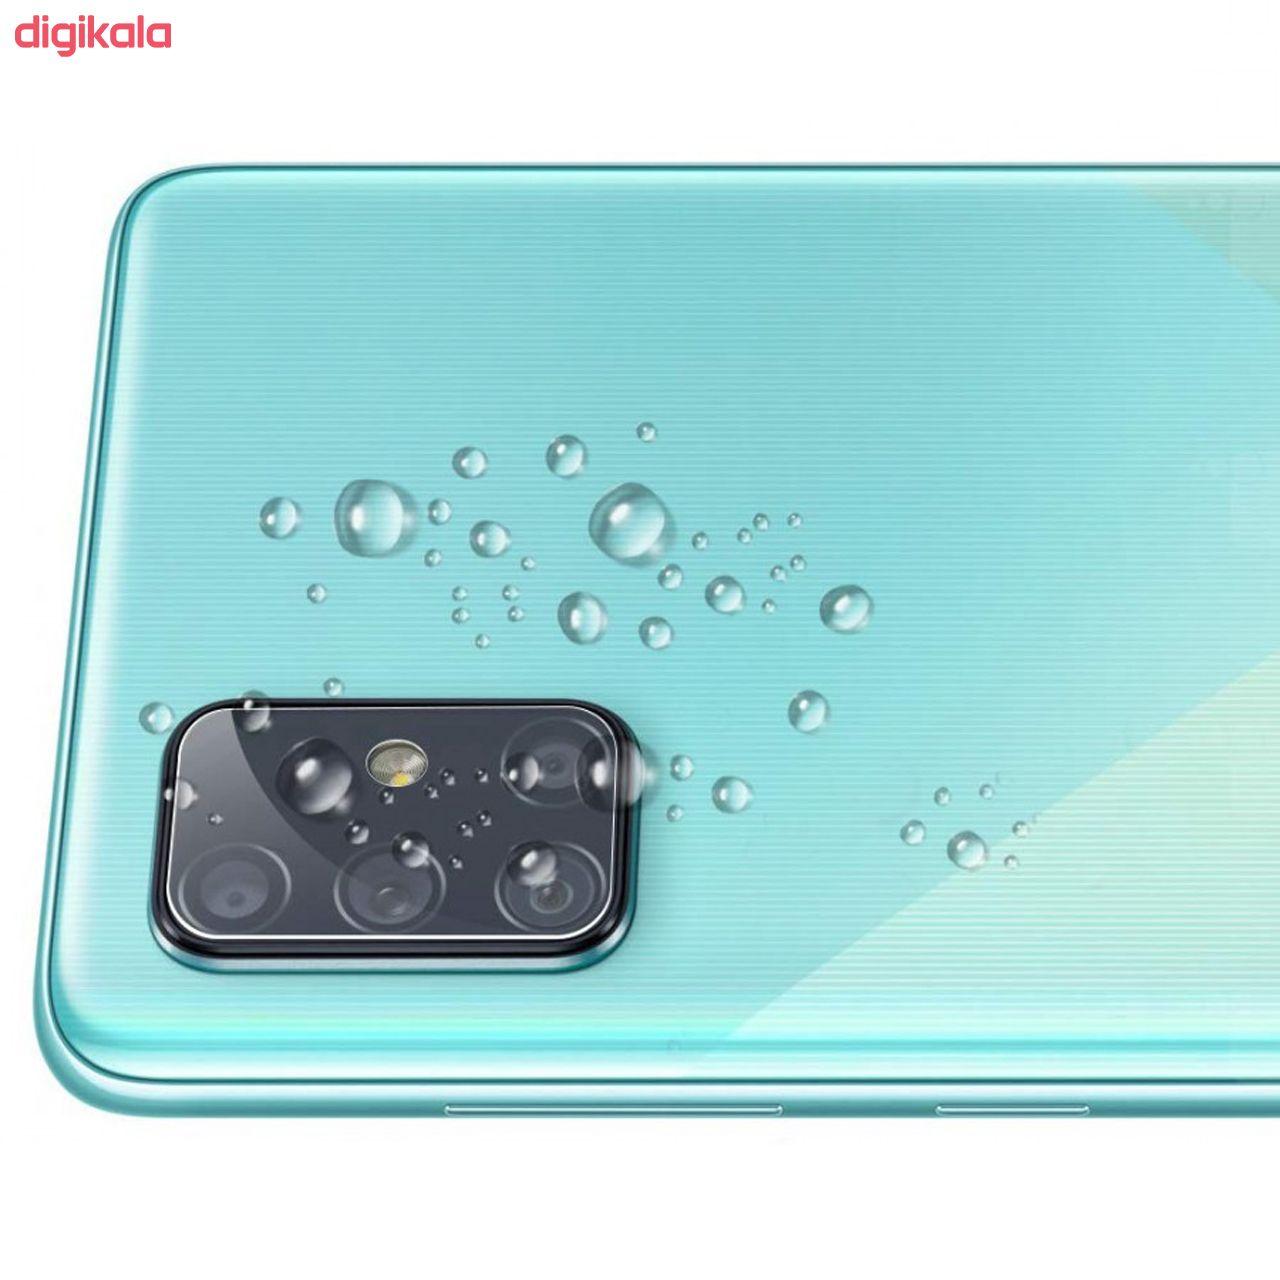 محافظ لنز دوربین سیحان مدل GLP مناسب برای گوشی موبایل سامسونگ Galaxy A51 main 1 5